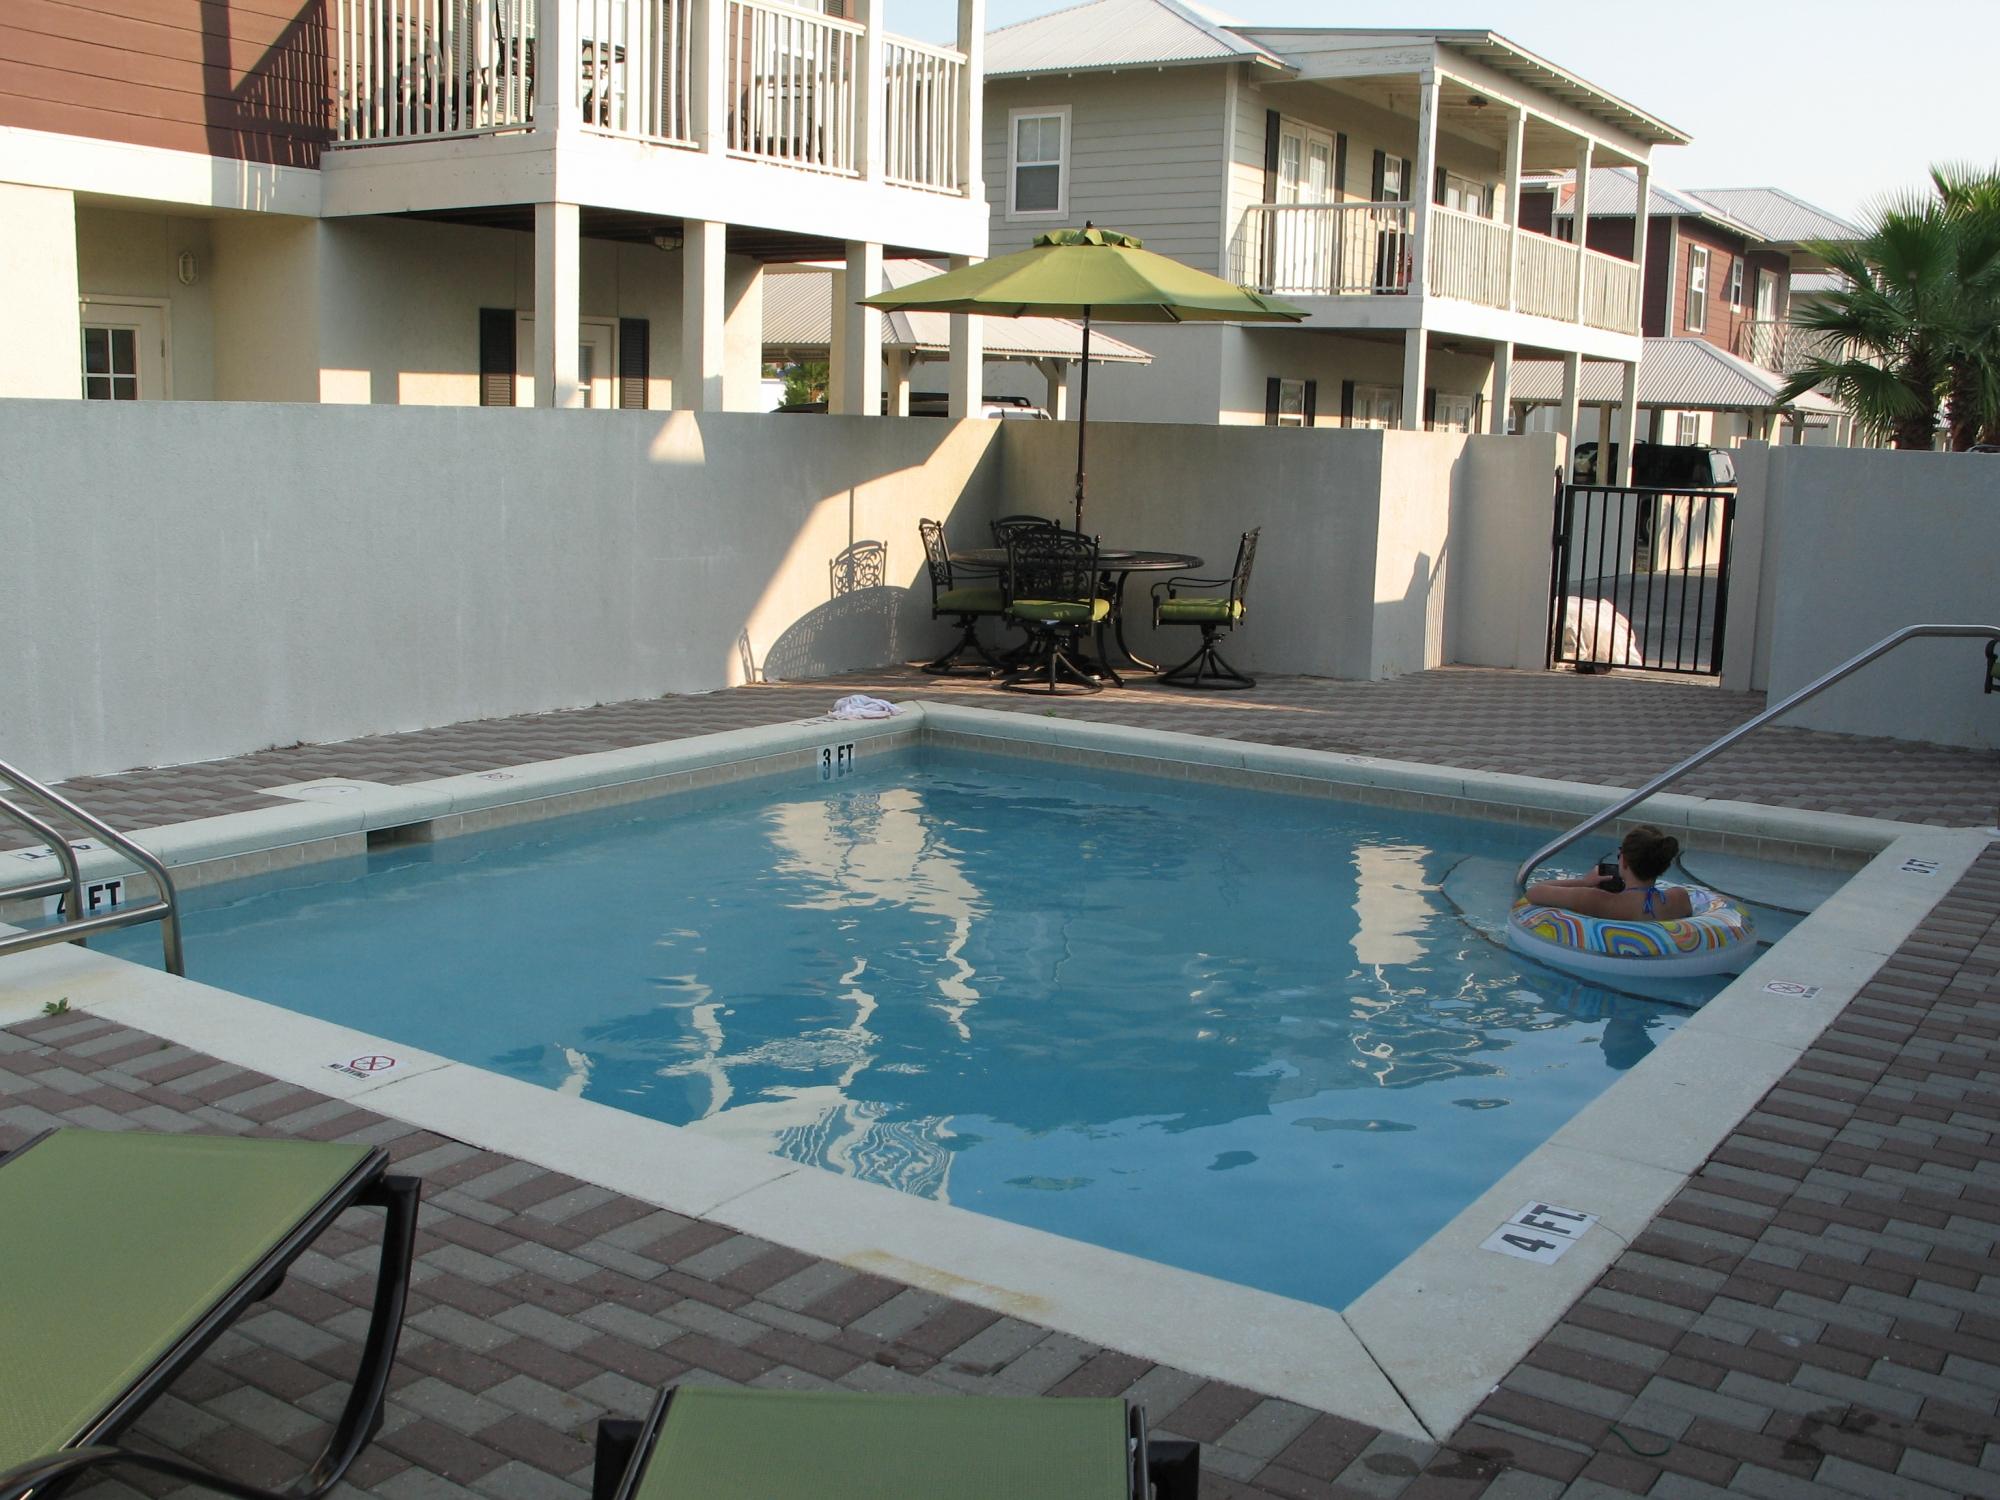 Vacation Al Beach House Amenities